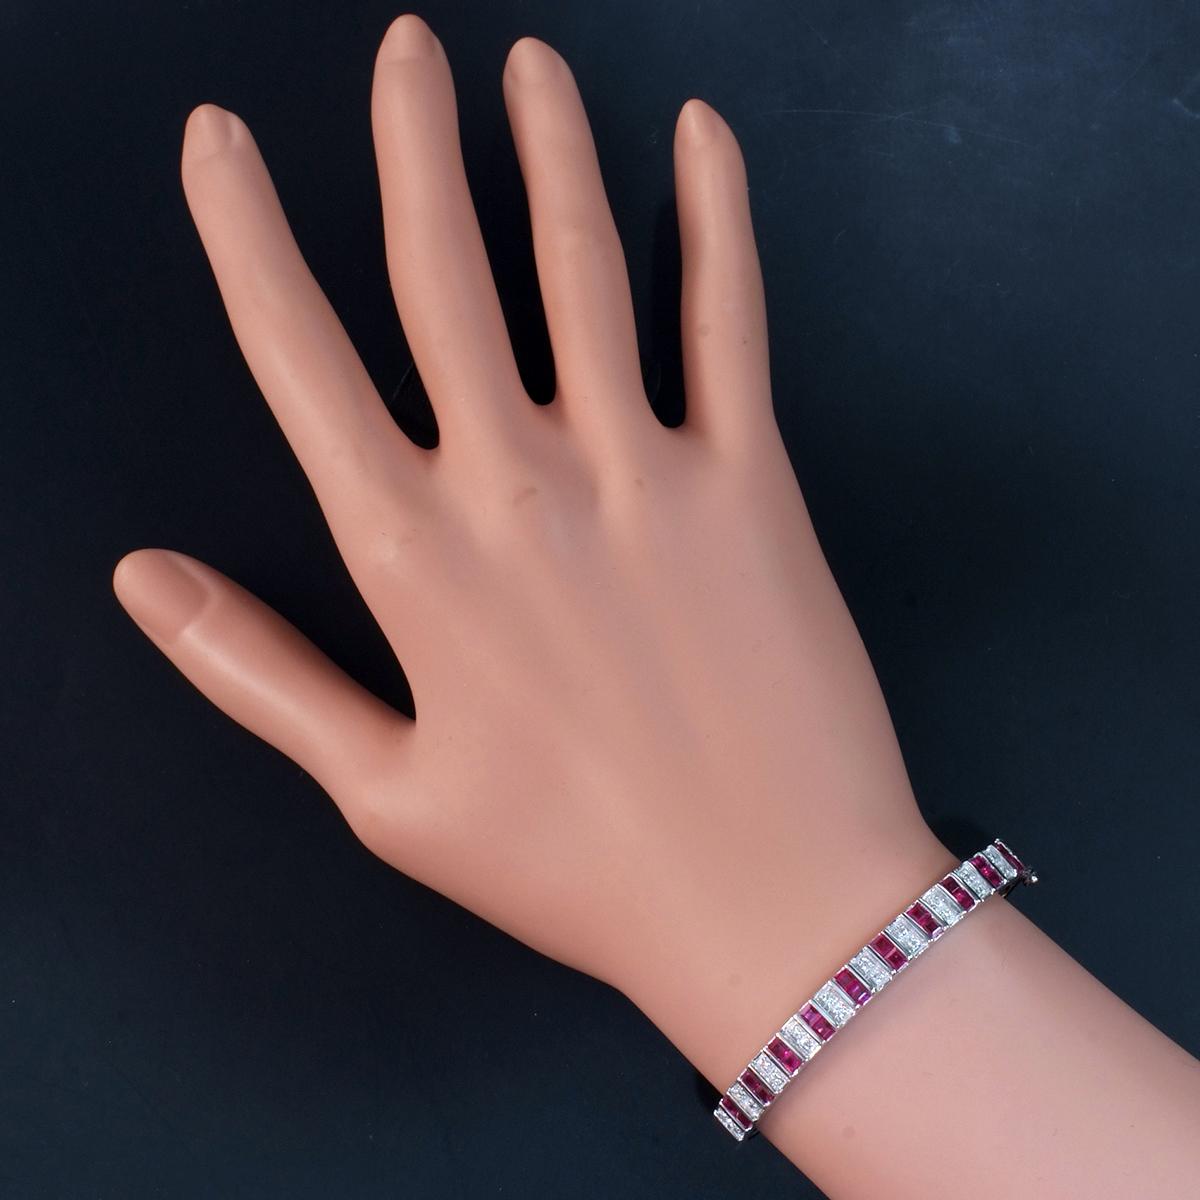 F0241 美しいルビー2.64ct 天然絶品ダイヤモンド0.12ct 最高級14金WG無垢バングル 腕周り15.5cm 重量15.06g 縦幅6.09mm_画像7